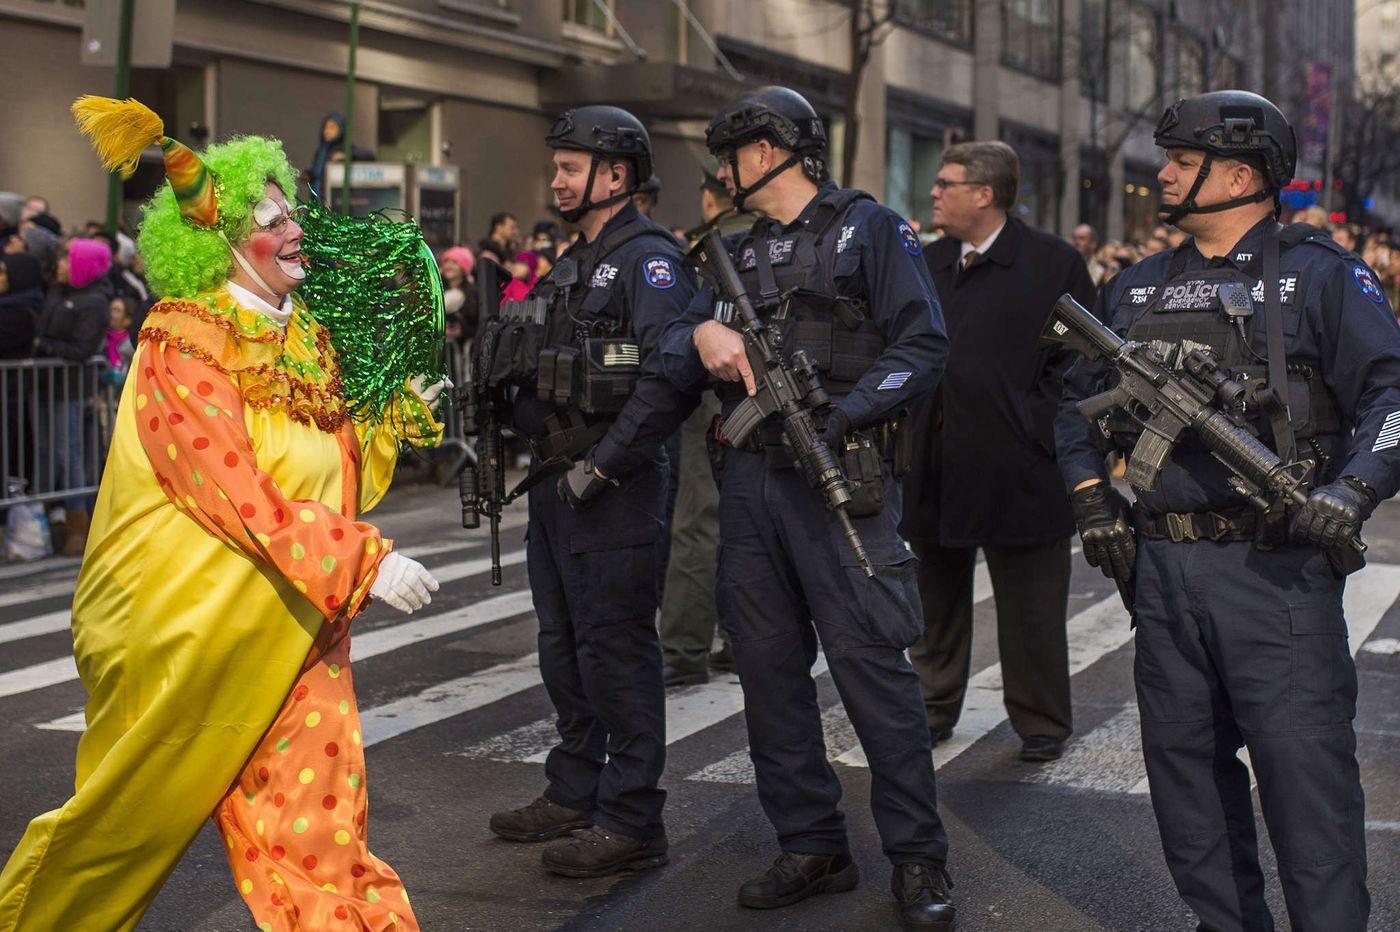 Macy's parade draws record police presence